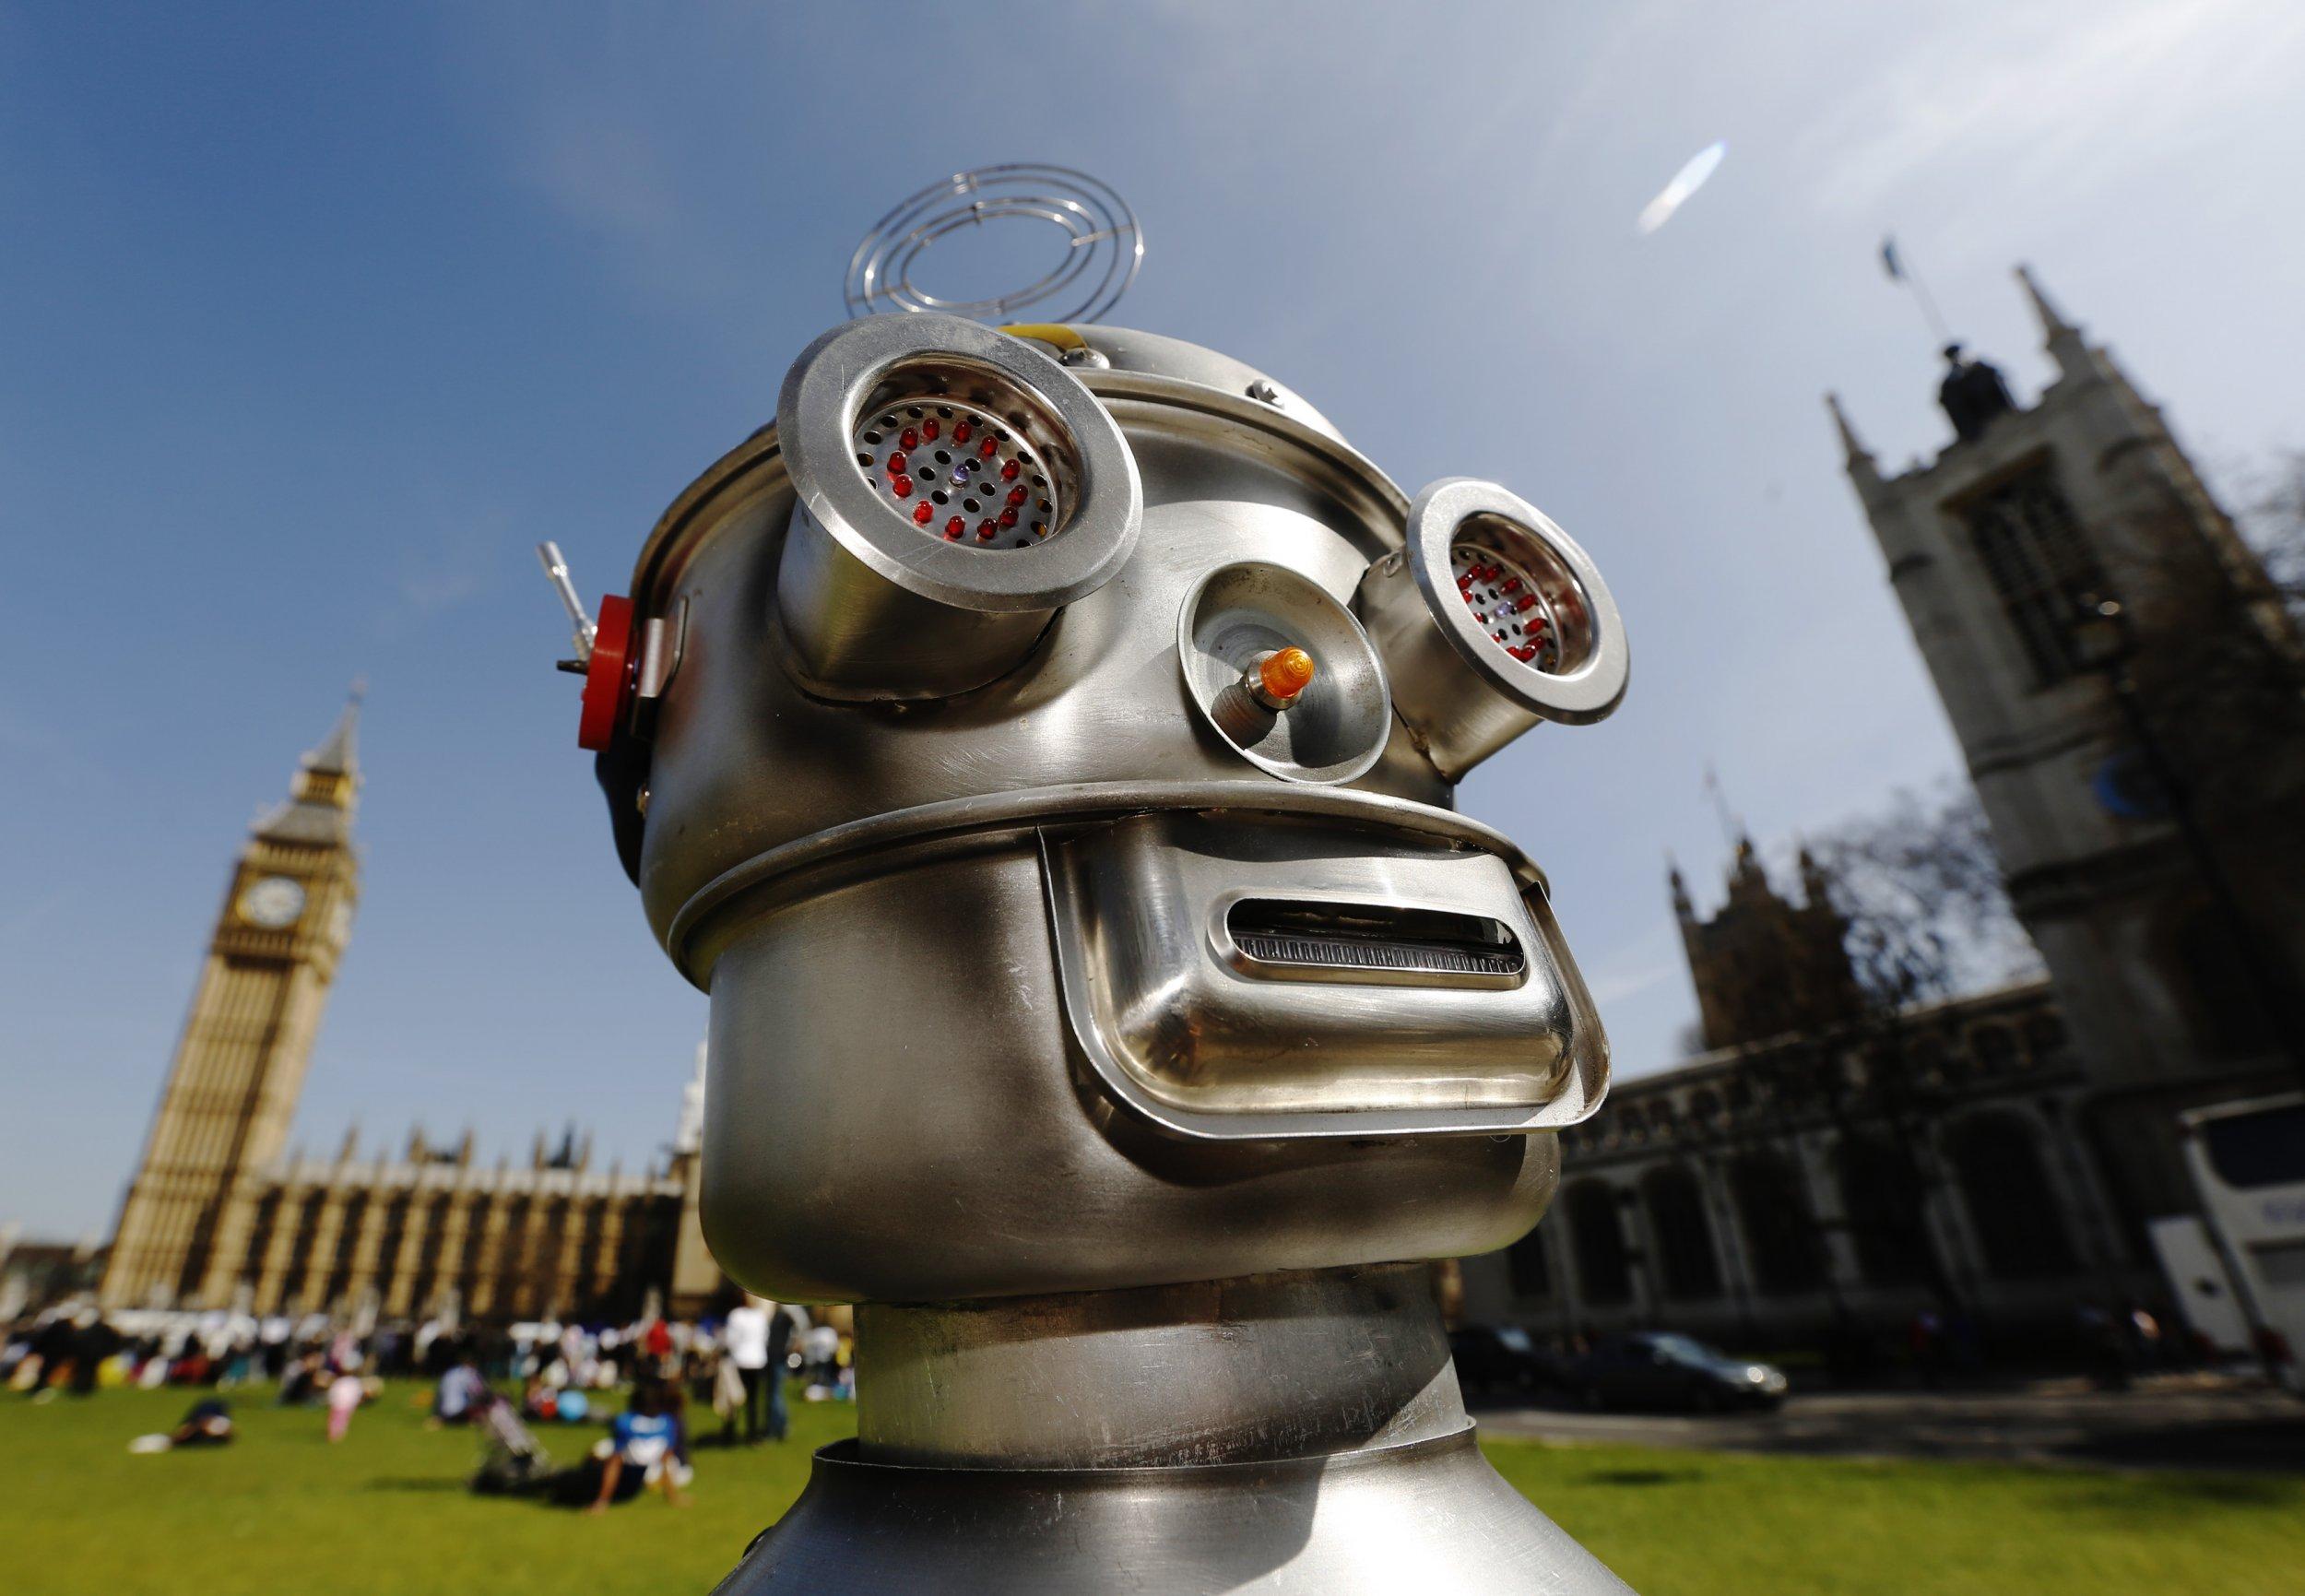 Elon Musk warns that killer robots could devastate mankind